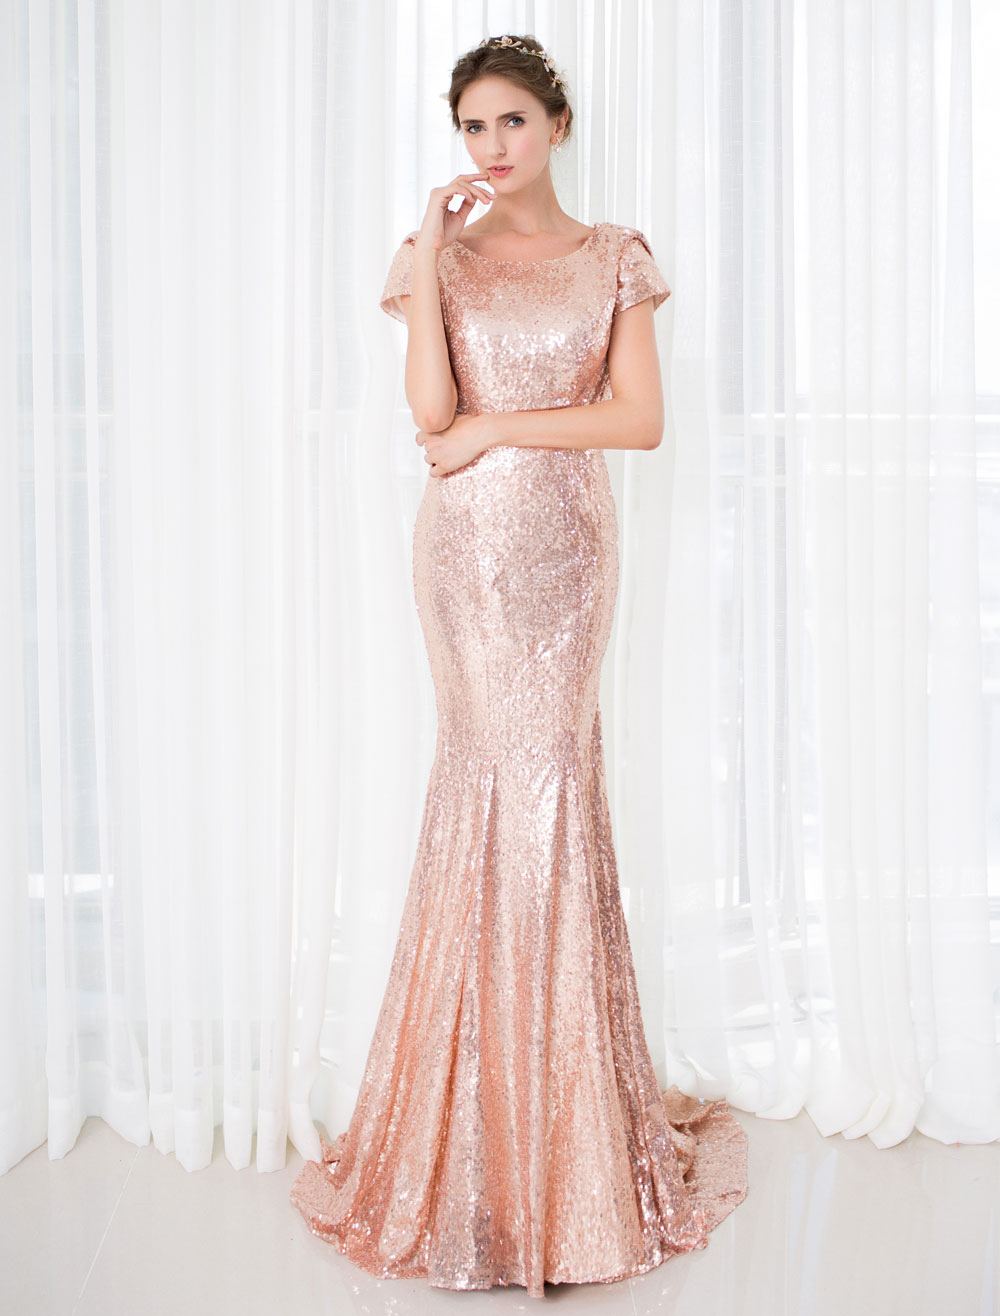 Rose Gold Prom Dresses 2018 Long Nude Mermaid Backless Evening Dress Sequin Court Train Short Sleeve Red Carpet Dress